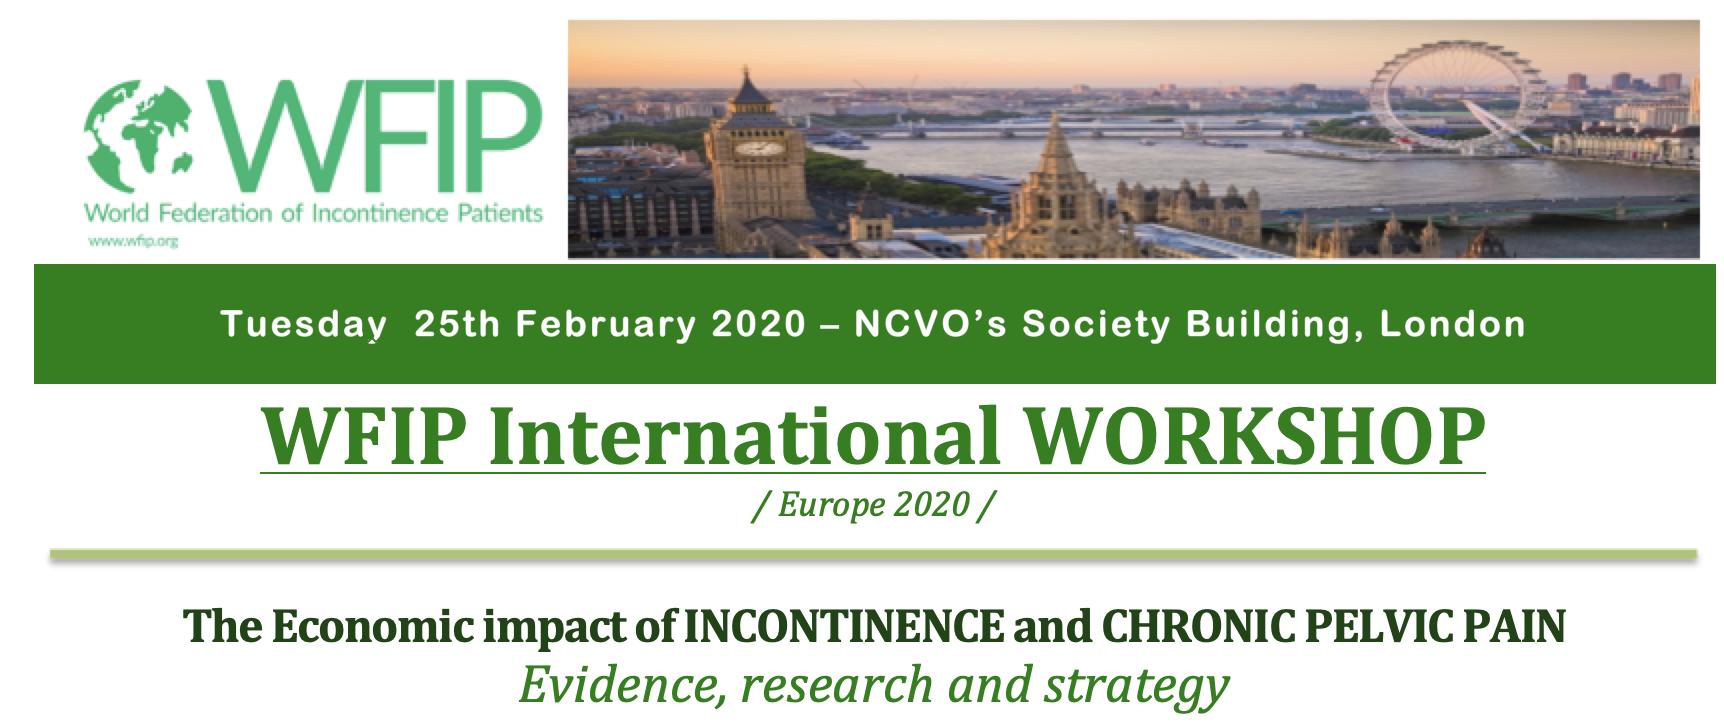 WFIP UK Workshop, London, 25th February